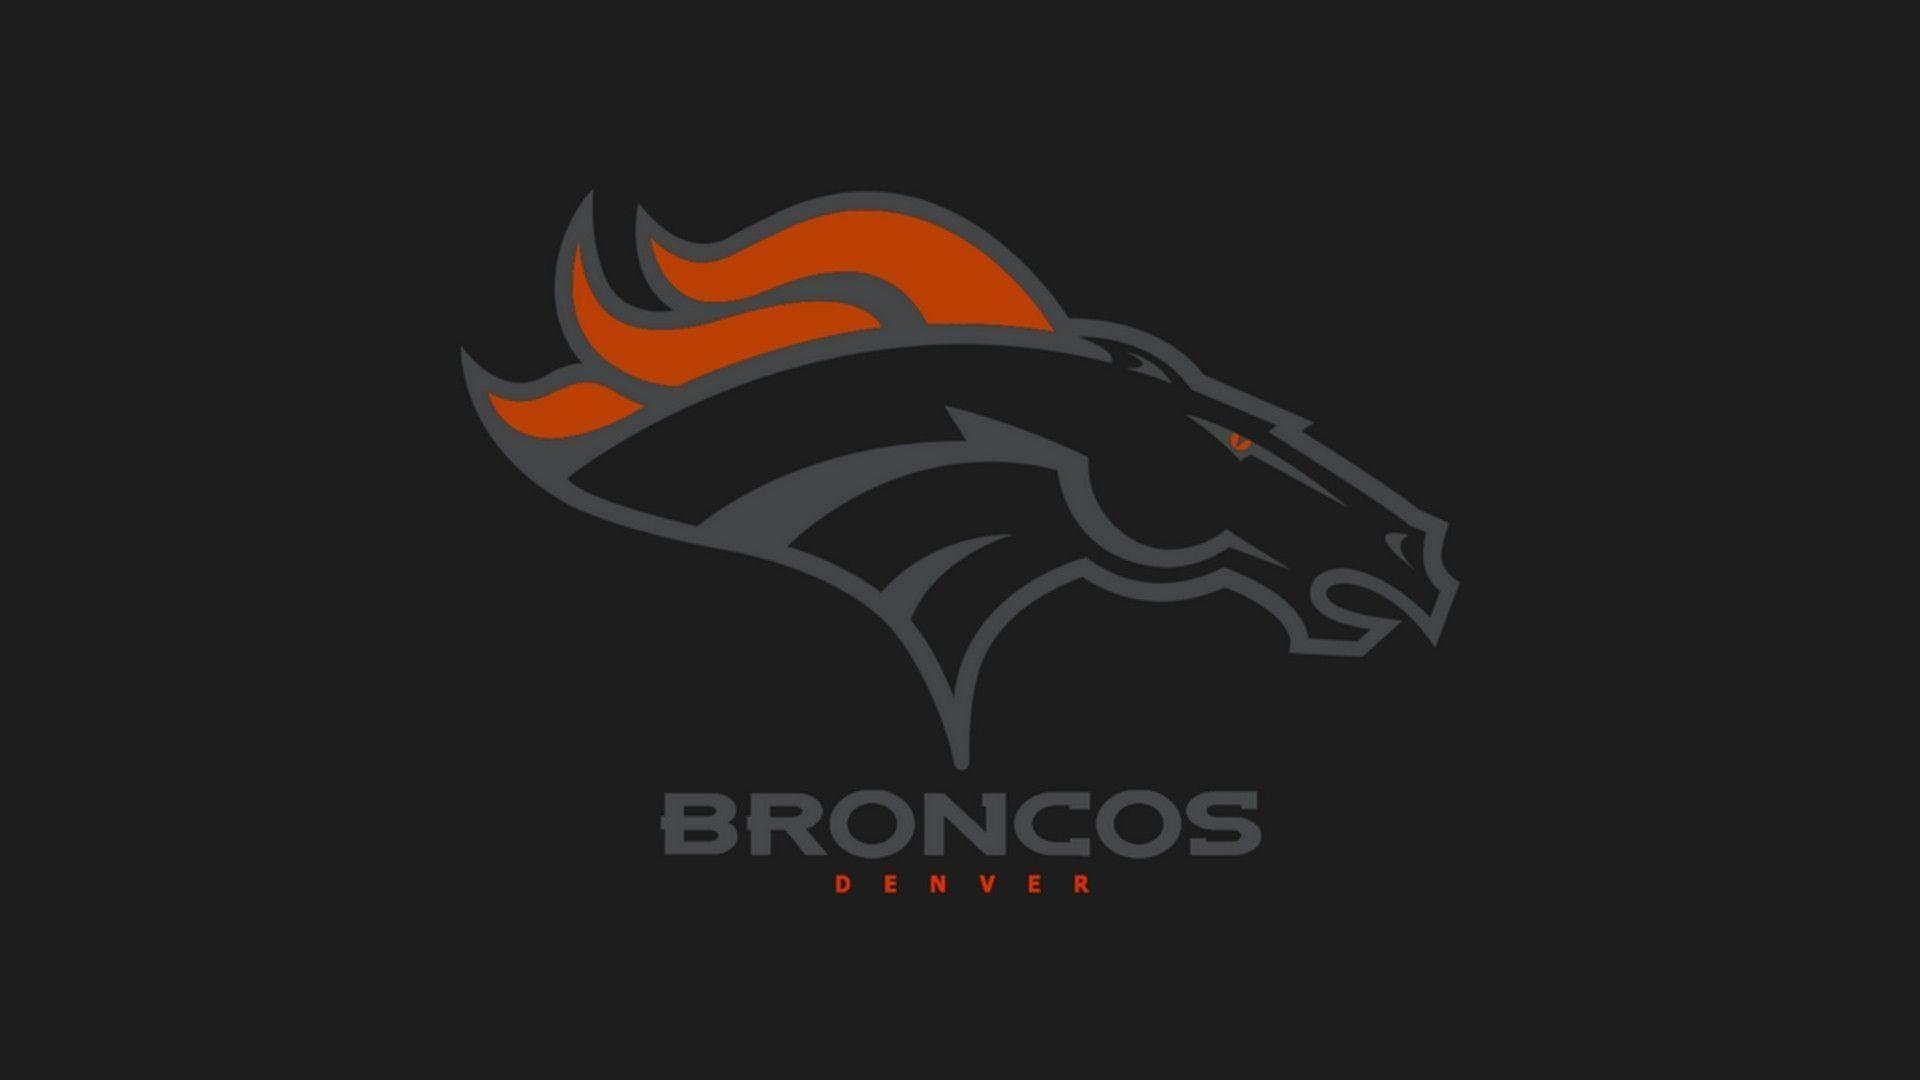 Denver Broncos computer background